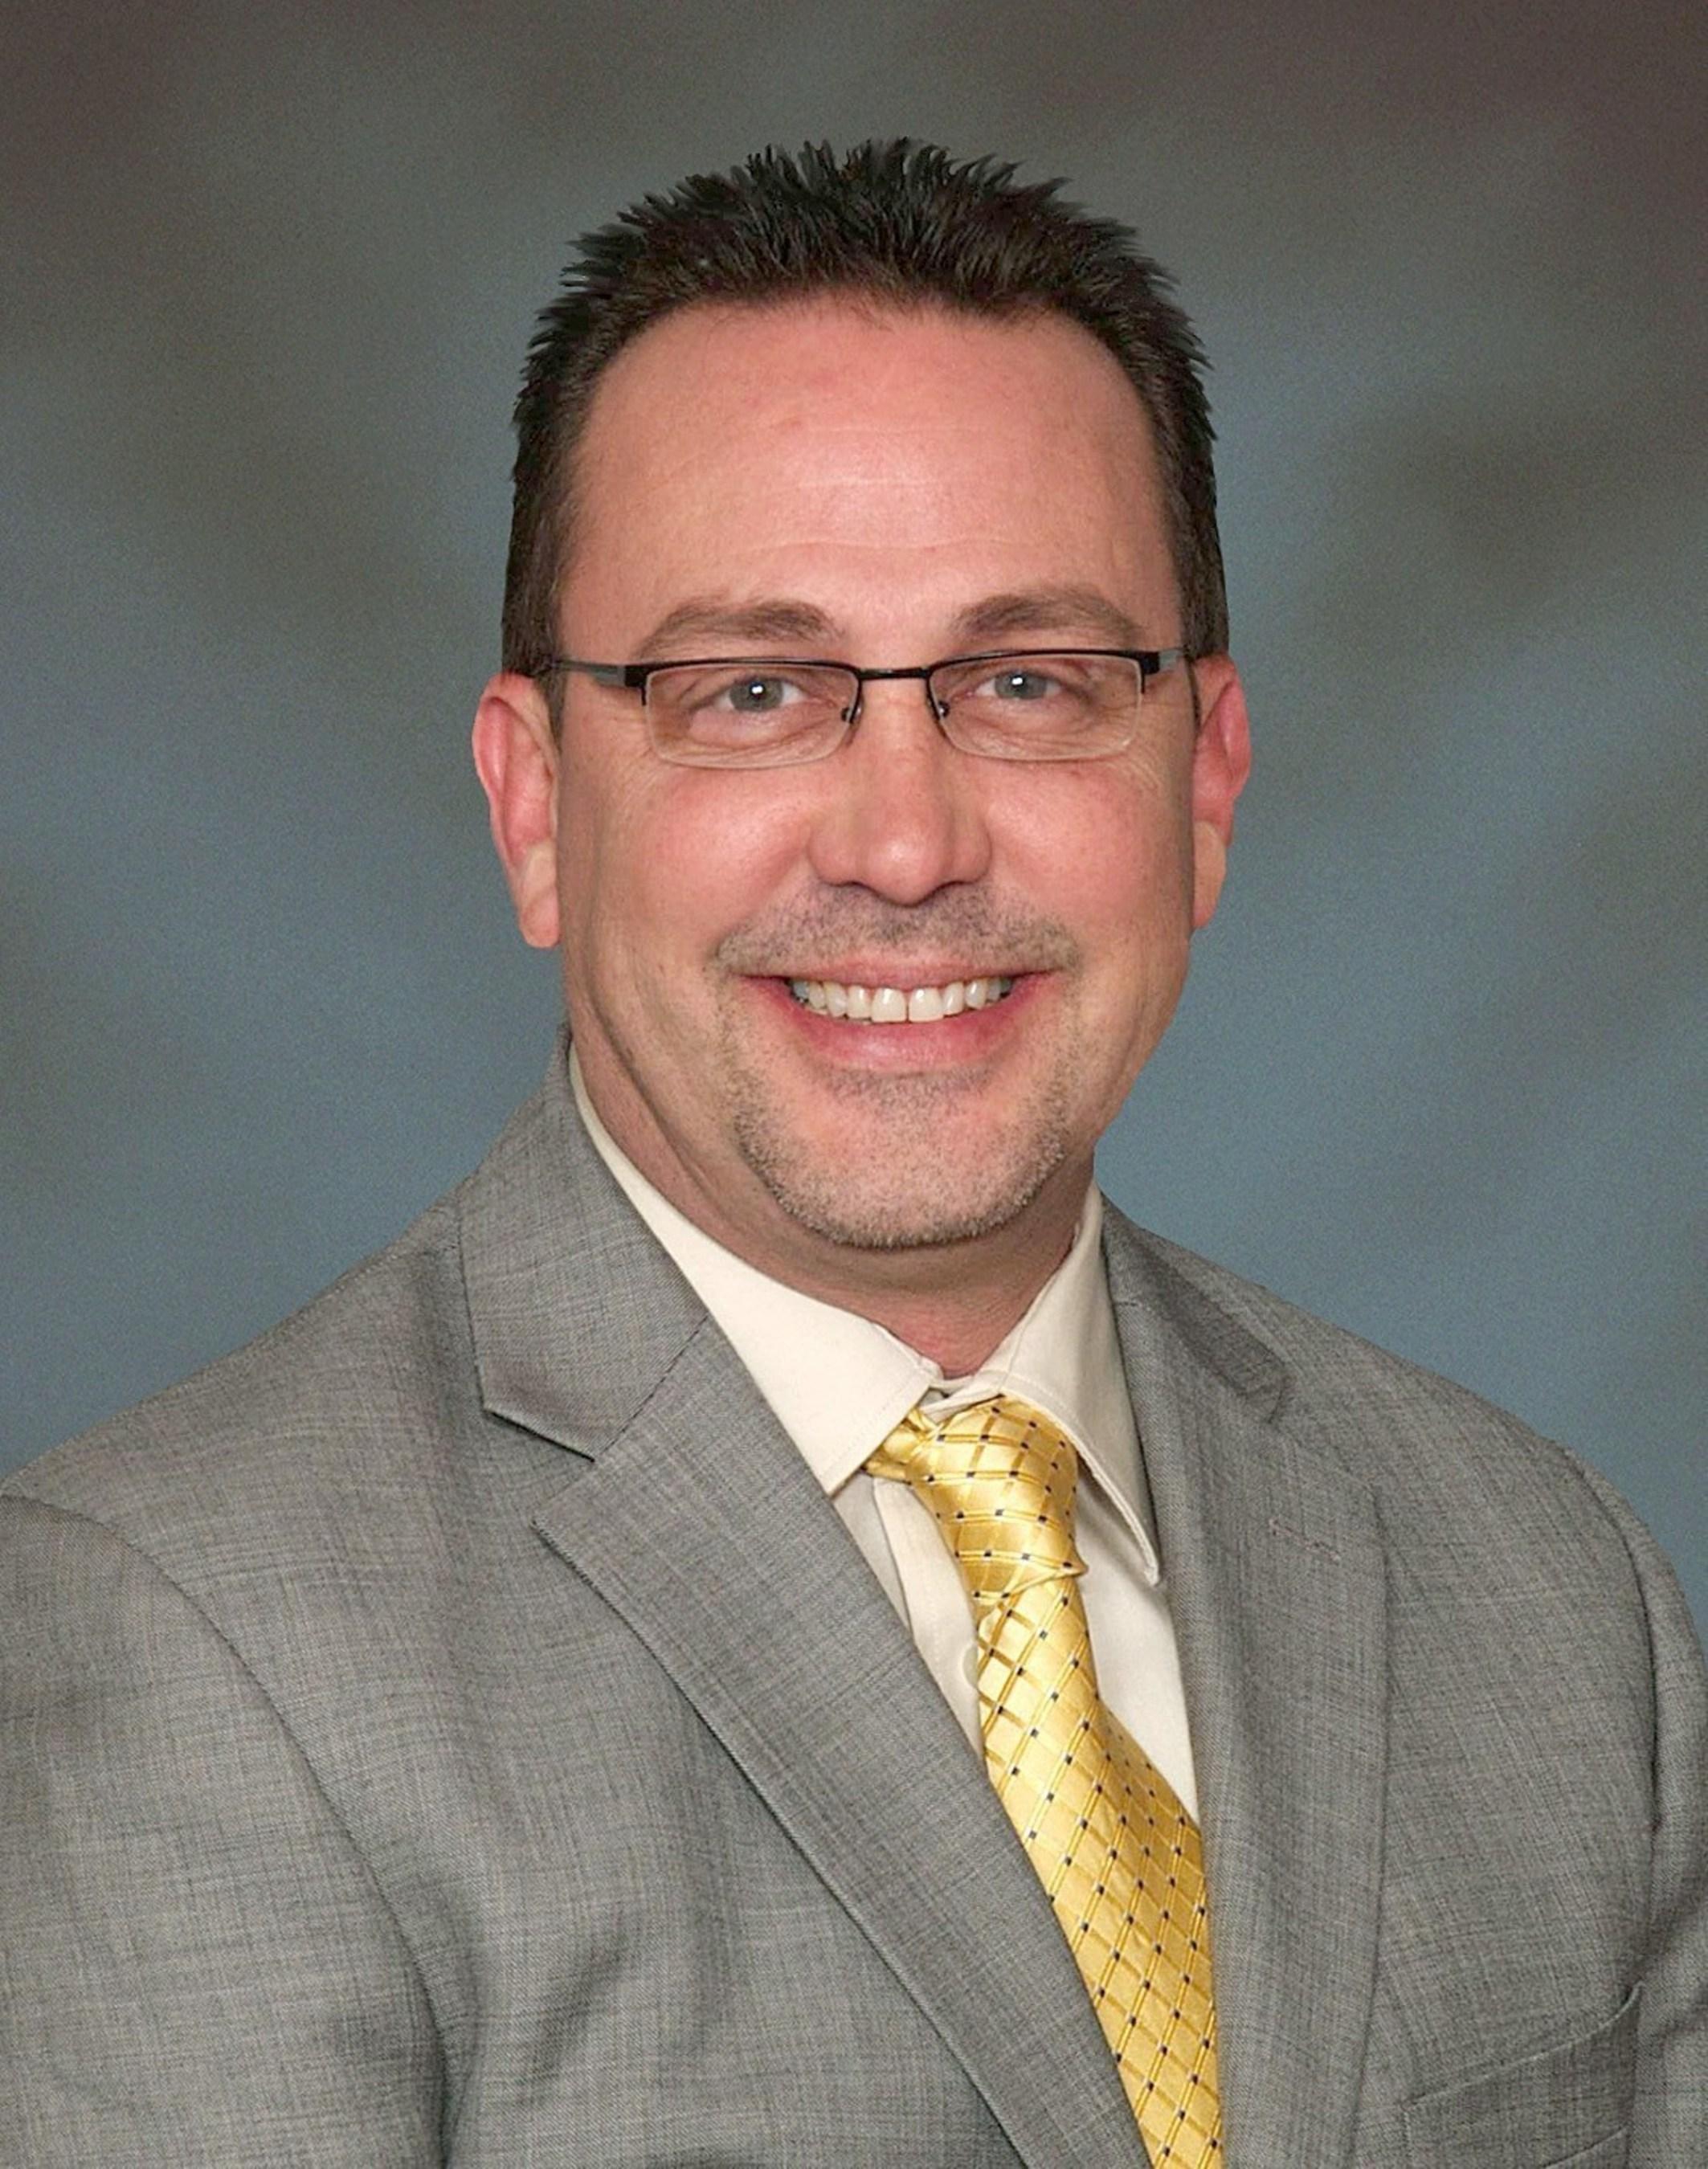 John Crandall of Associated Bank